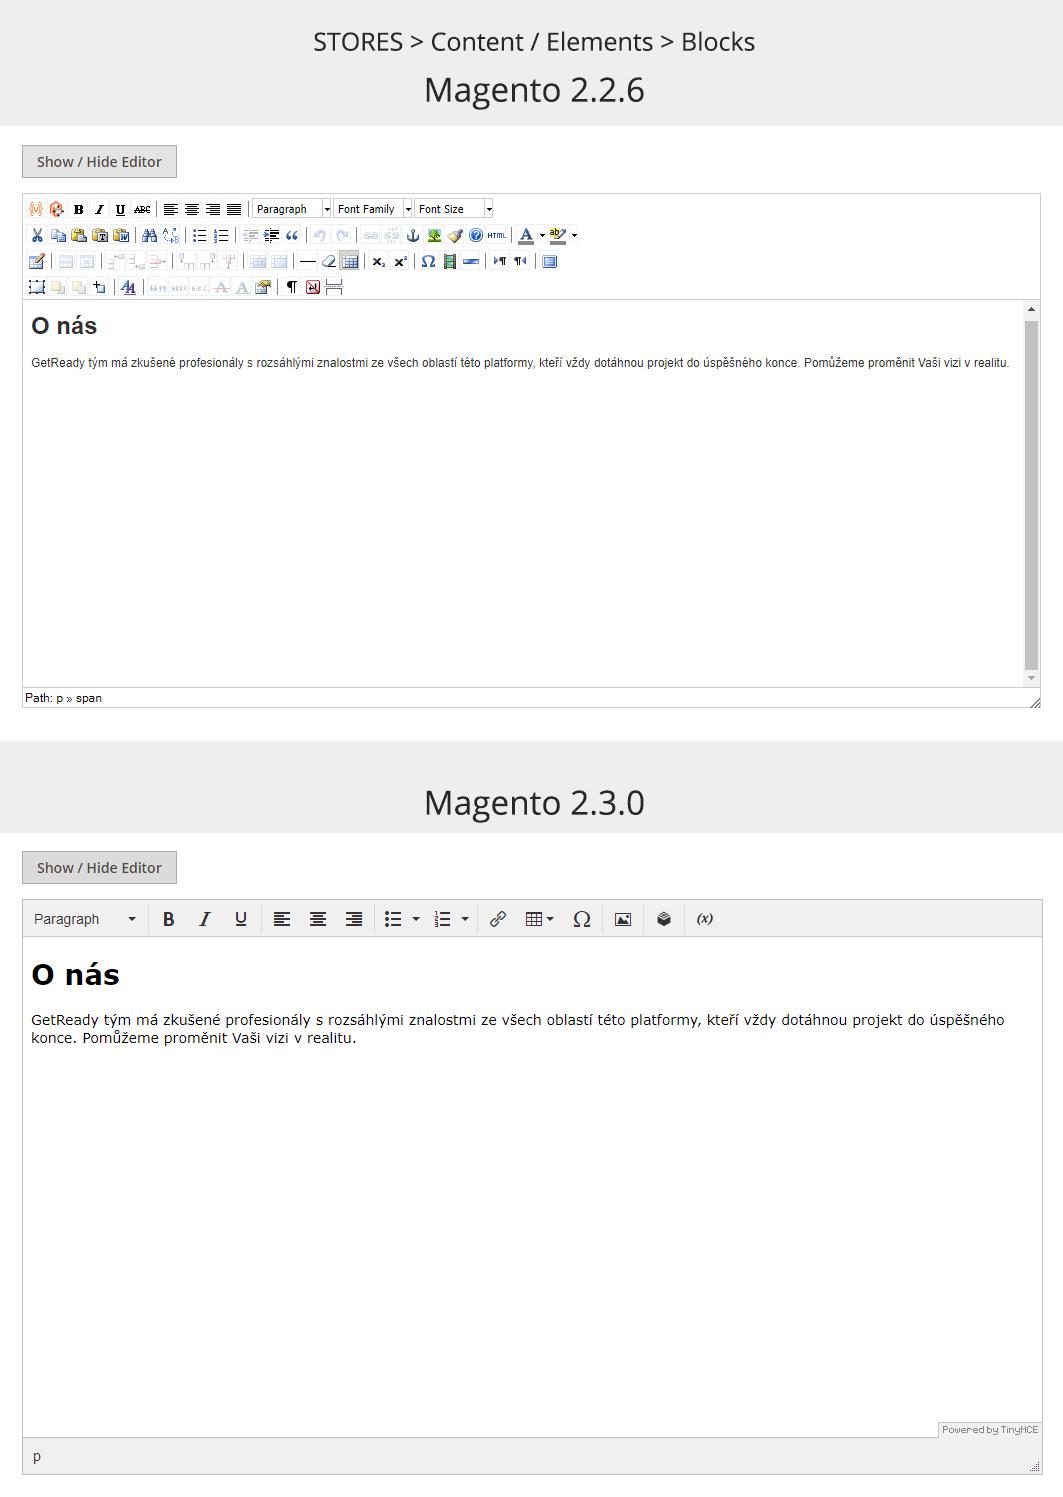 Magento WYSIWYG editor - text a nadpis H1 ve wysiwyg editoru